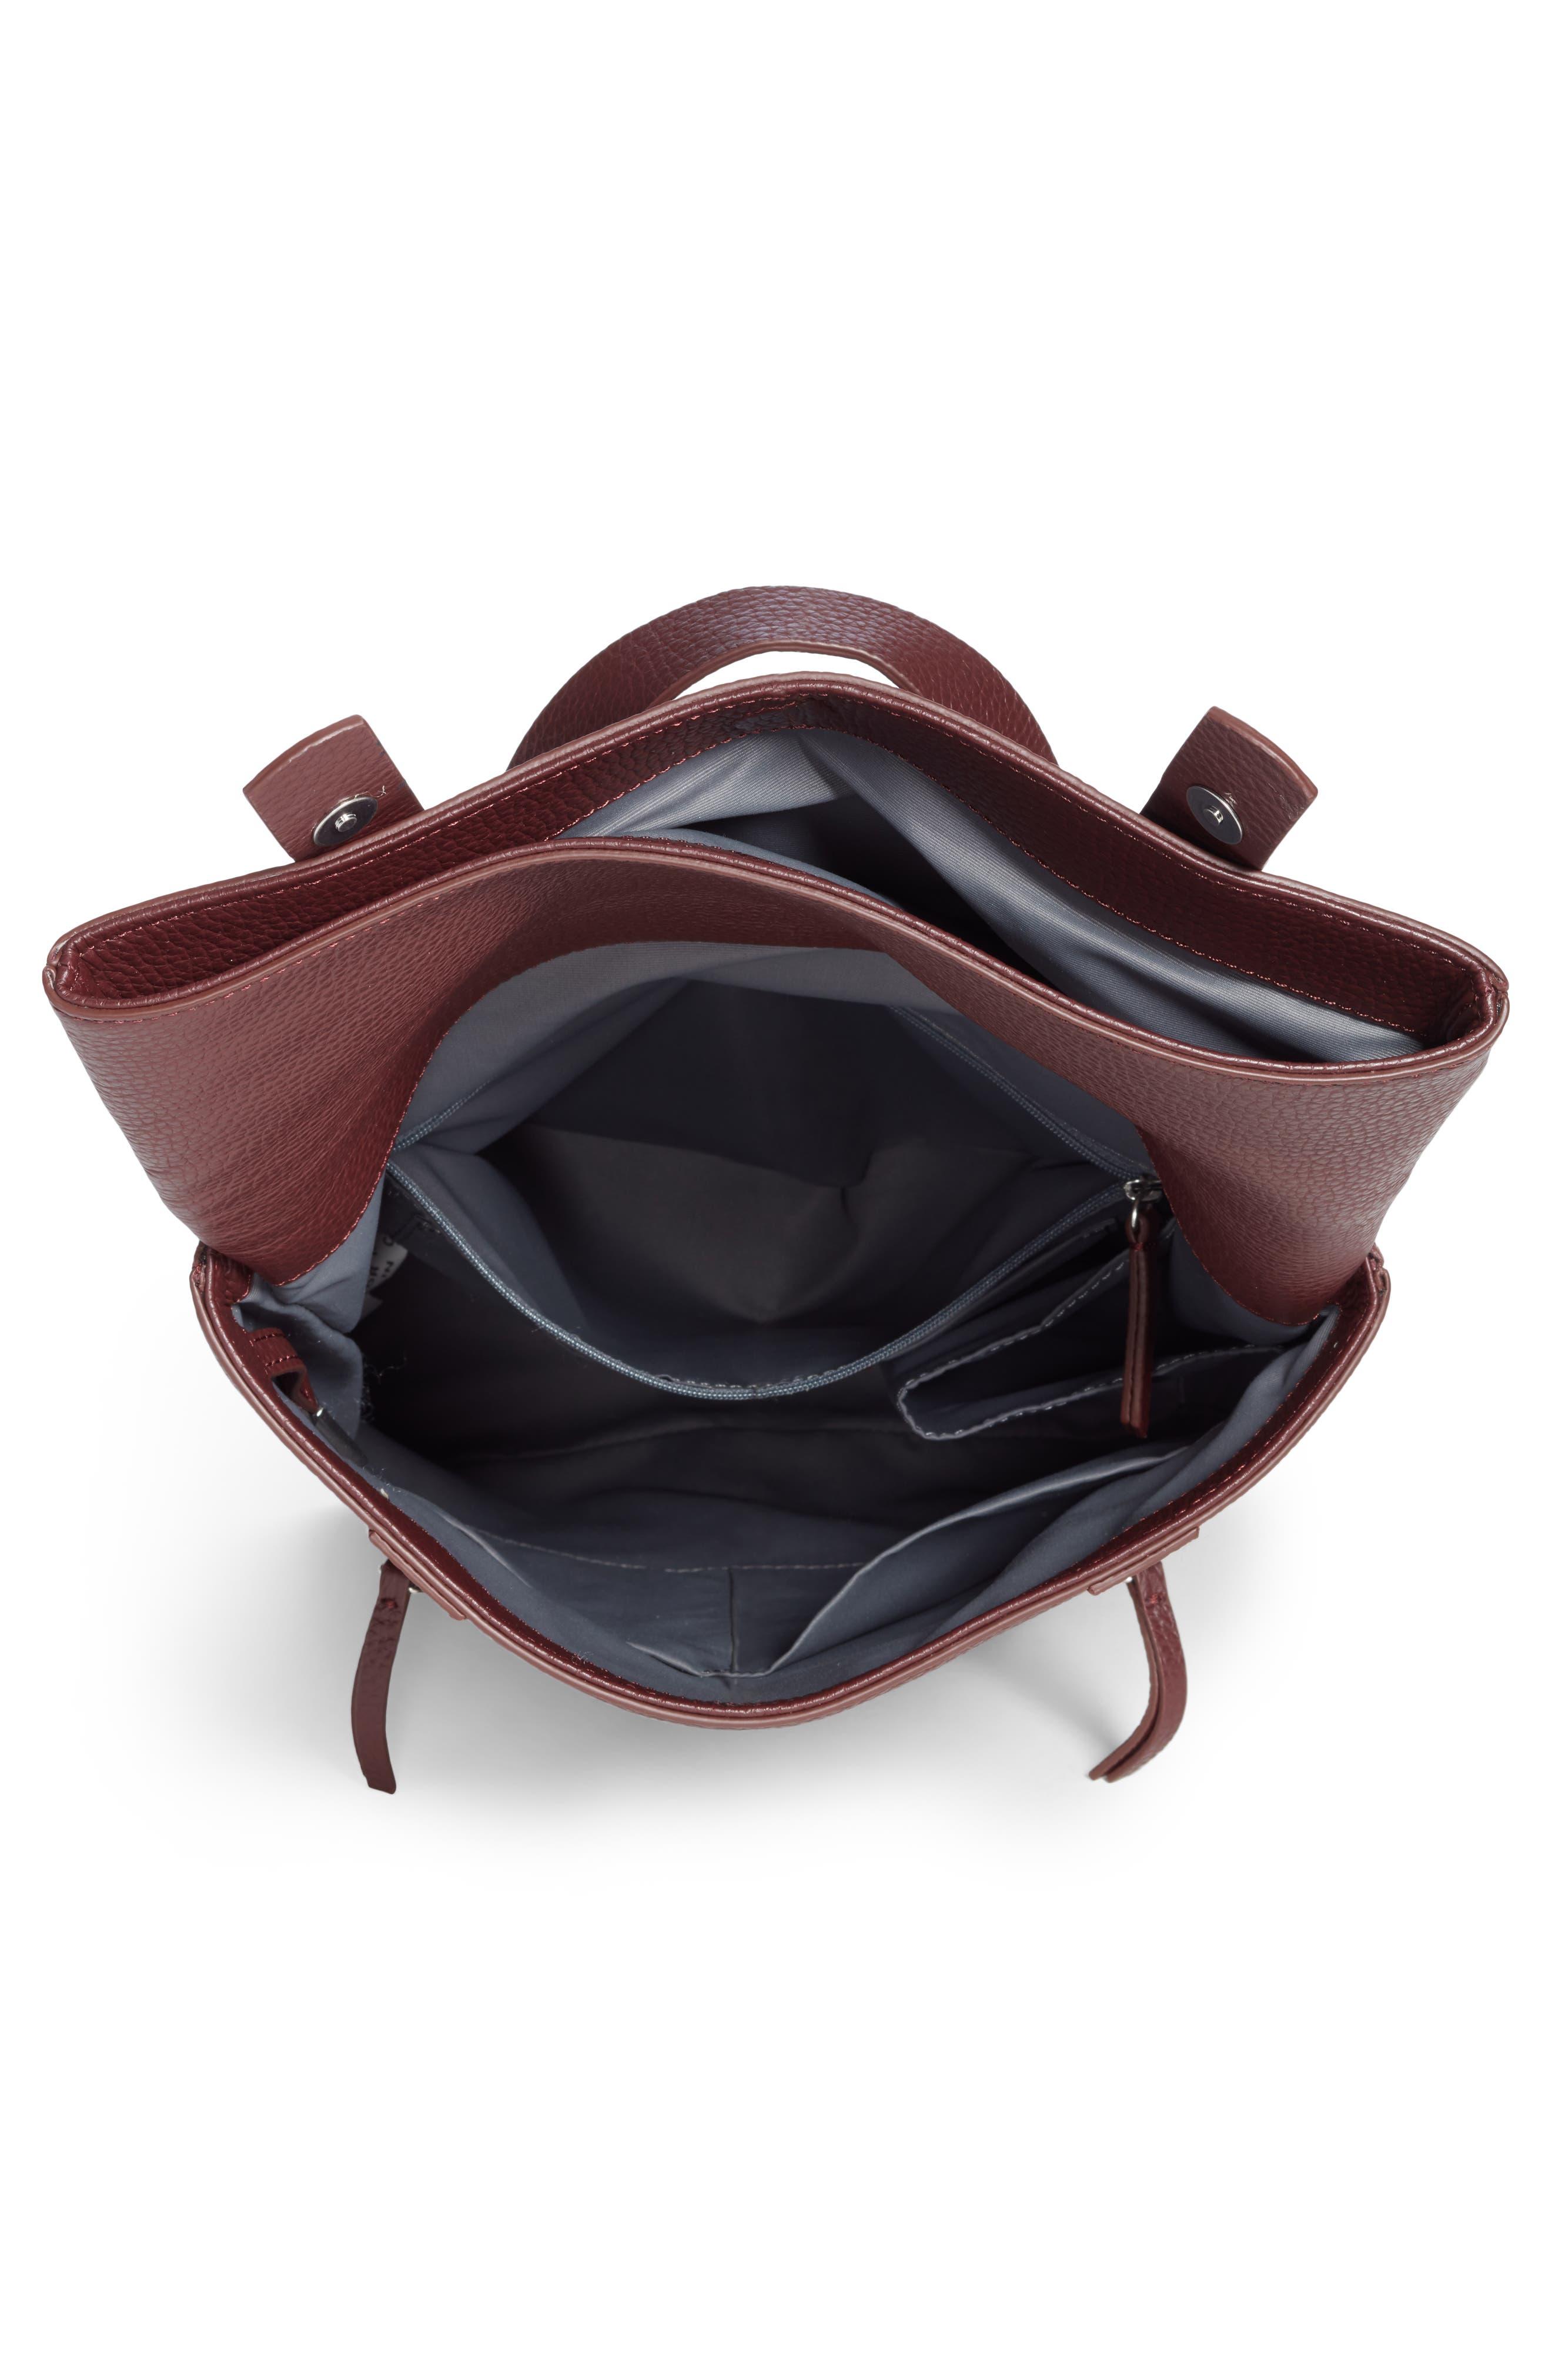 Remy Pebbled Leather Backpack,                             Alternate thumbnail 4, color,                             BURGUNDY FIG